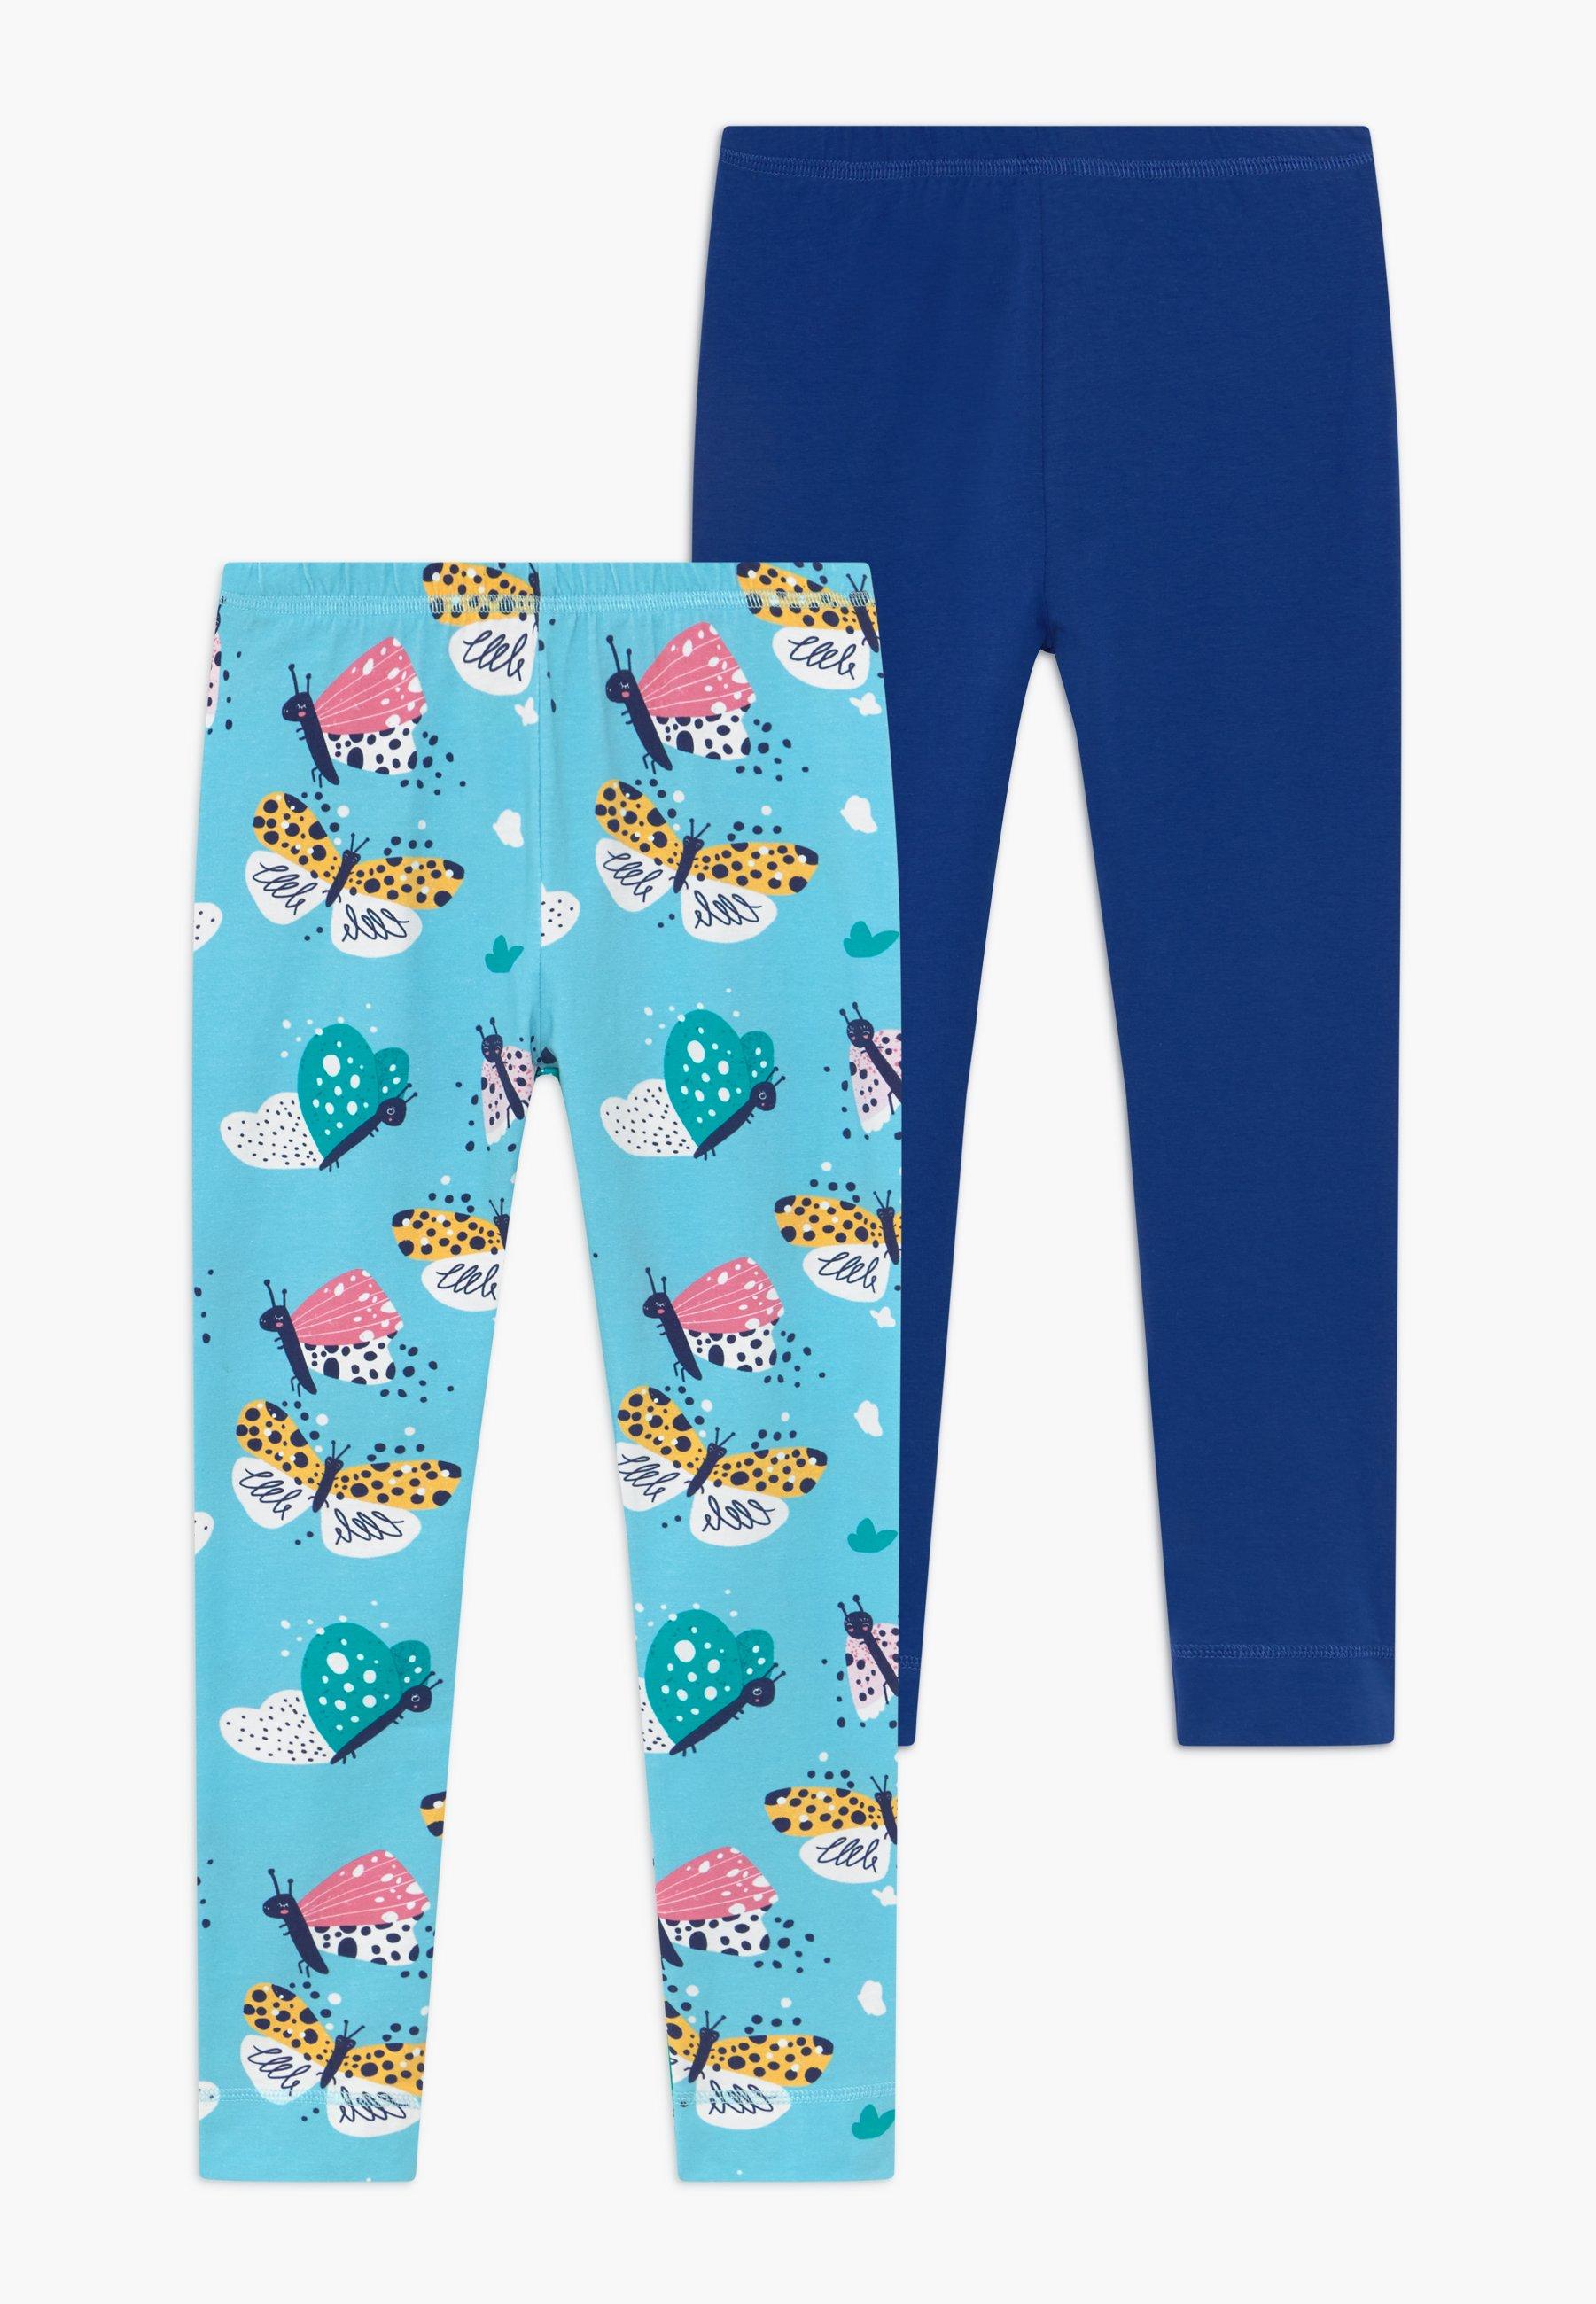 Kids FUNNY BUTTERFLIES 2 PACK - Leggings - Trousers